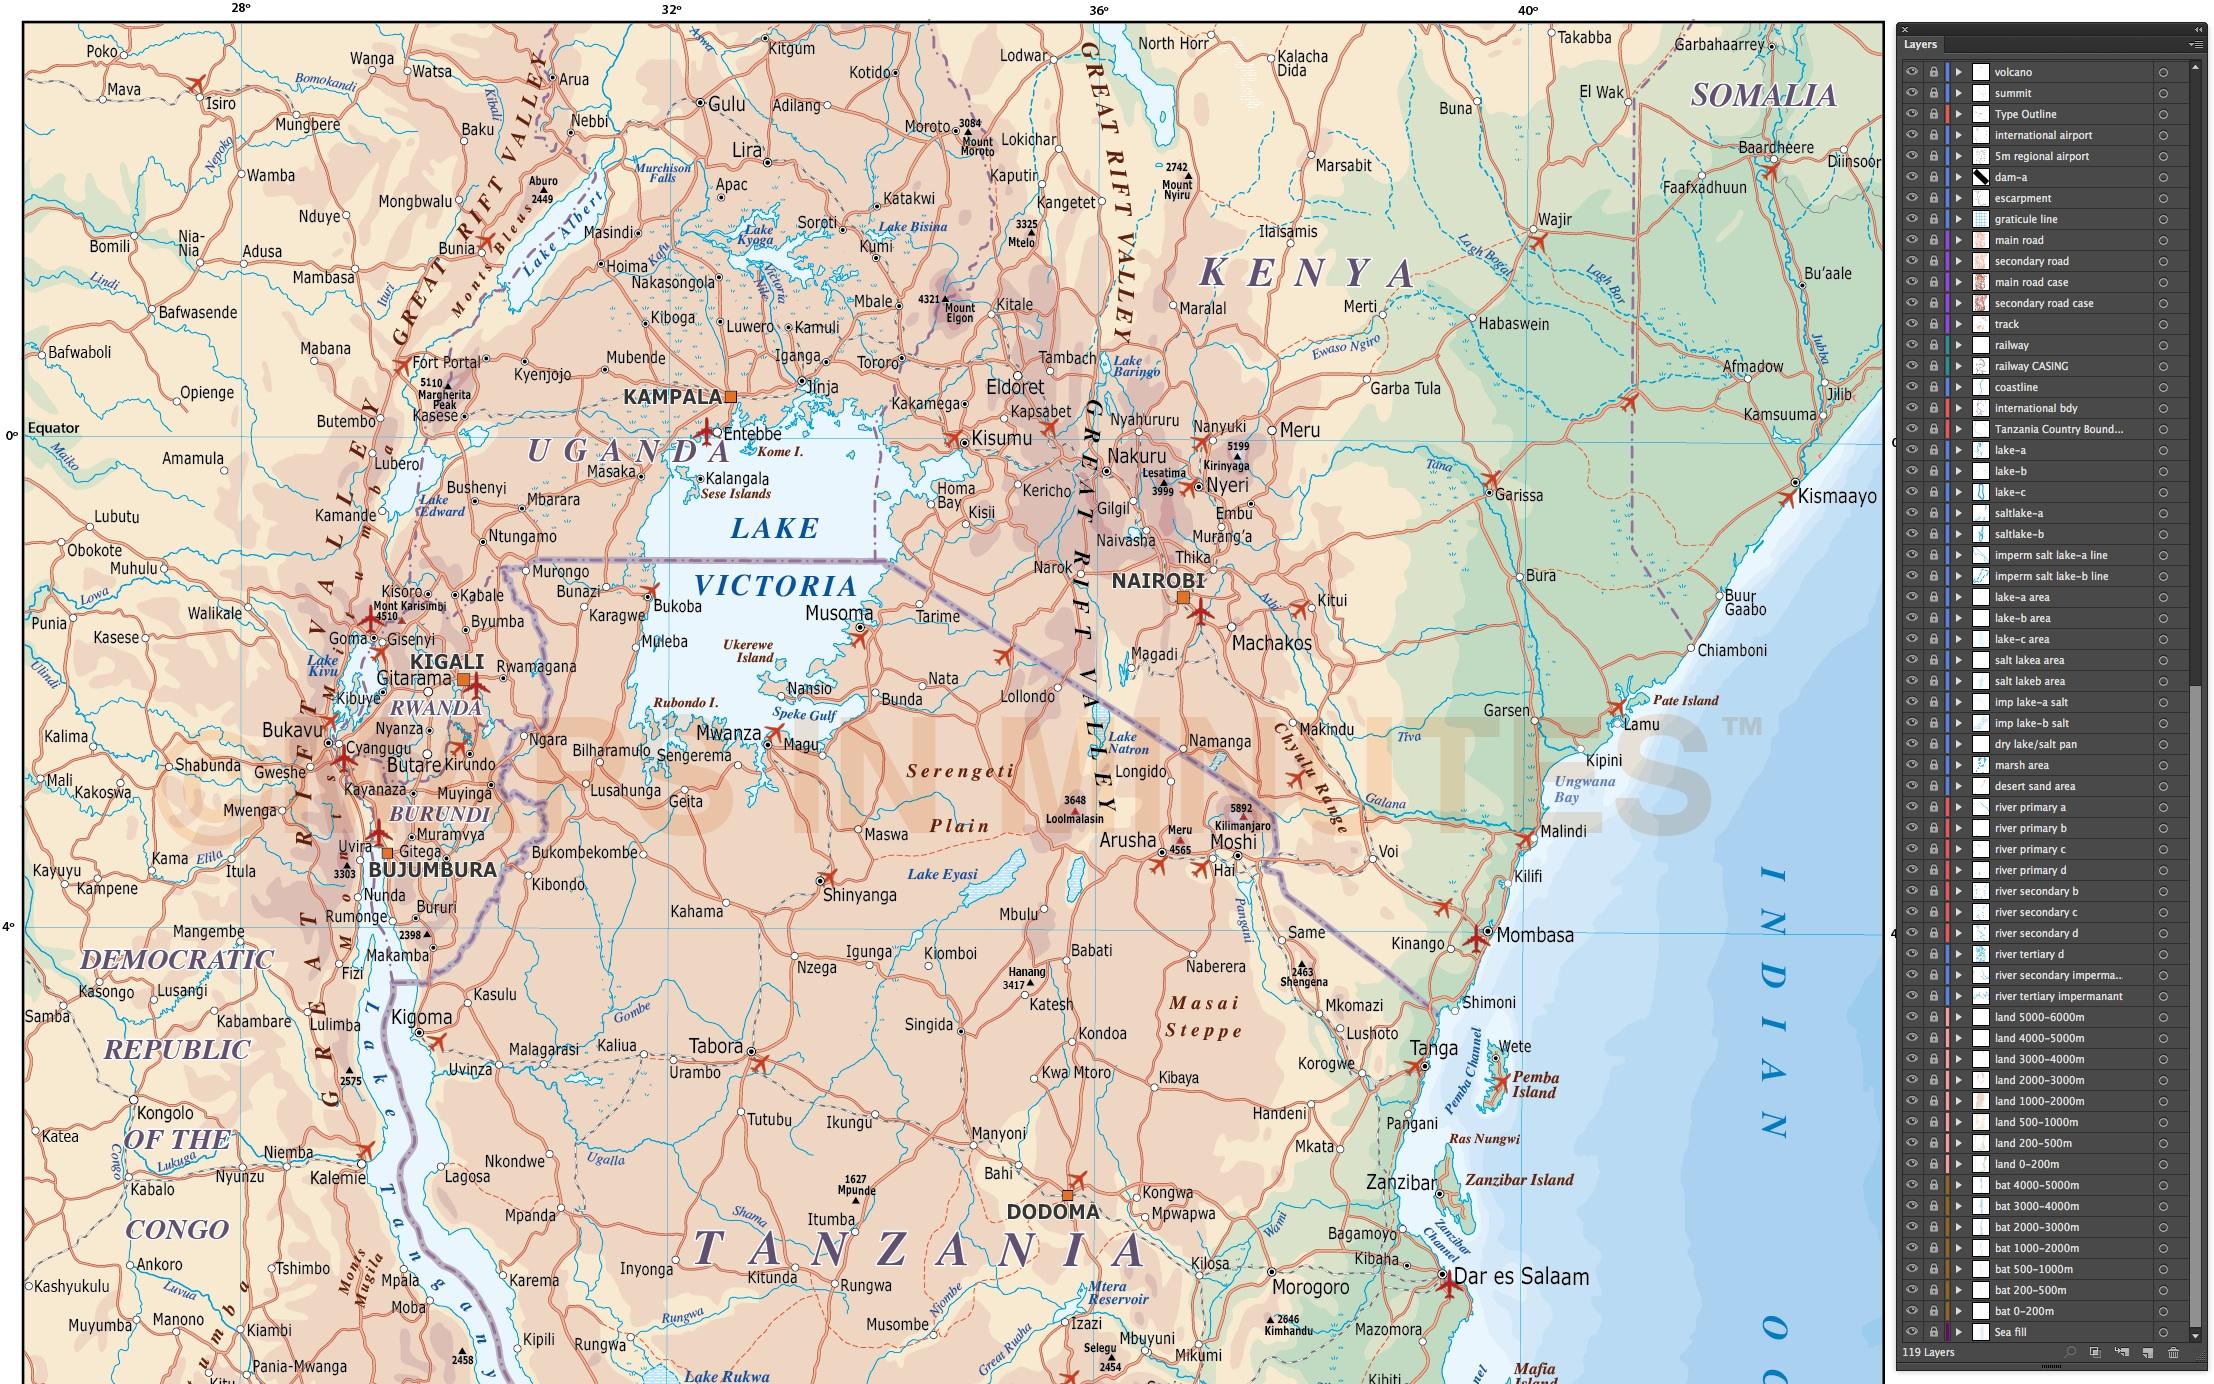 digital vector tanzania map road rail plus land and sea contours in illustrator format